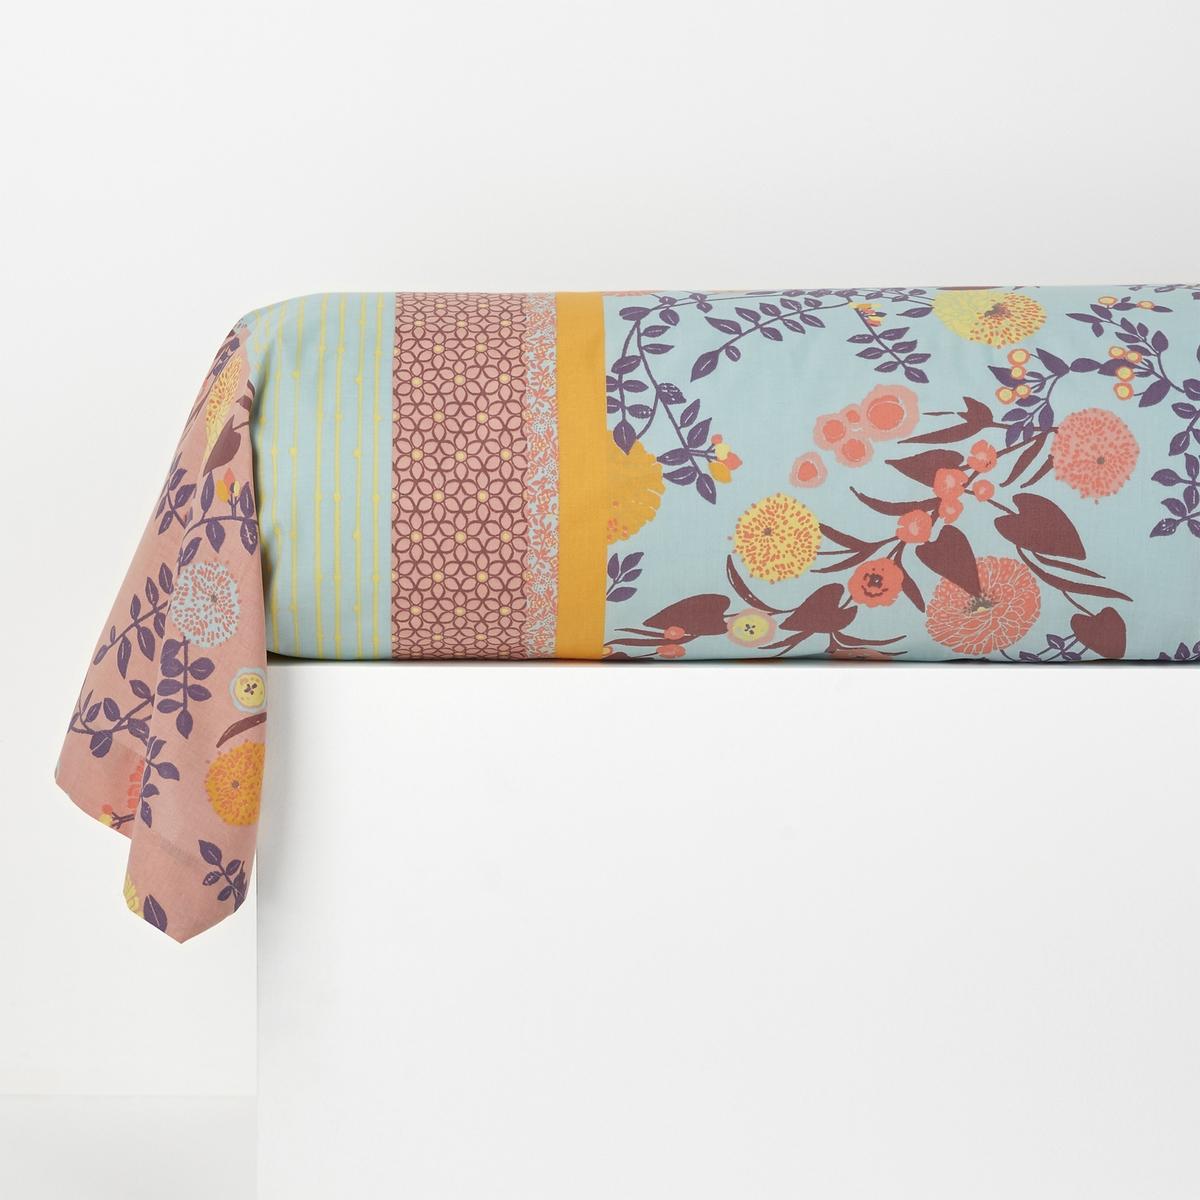 Наволочка на подушку-валик 100% хлопка, Shisendo